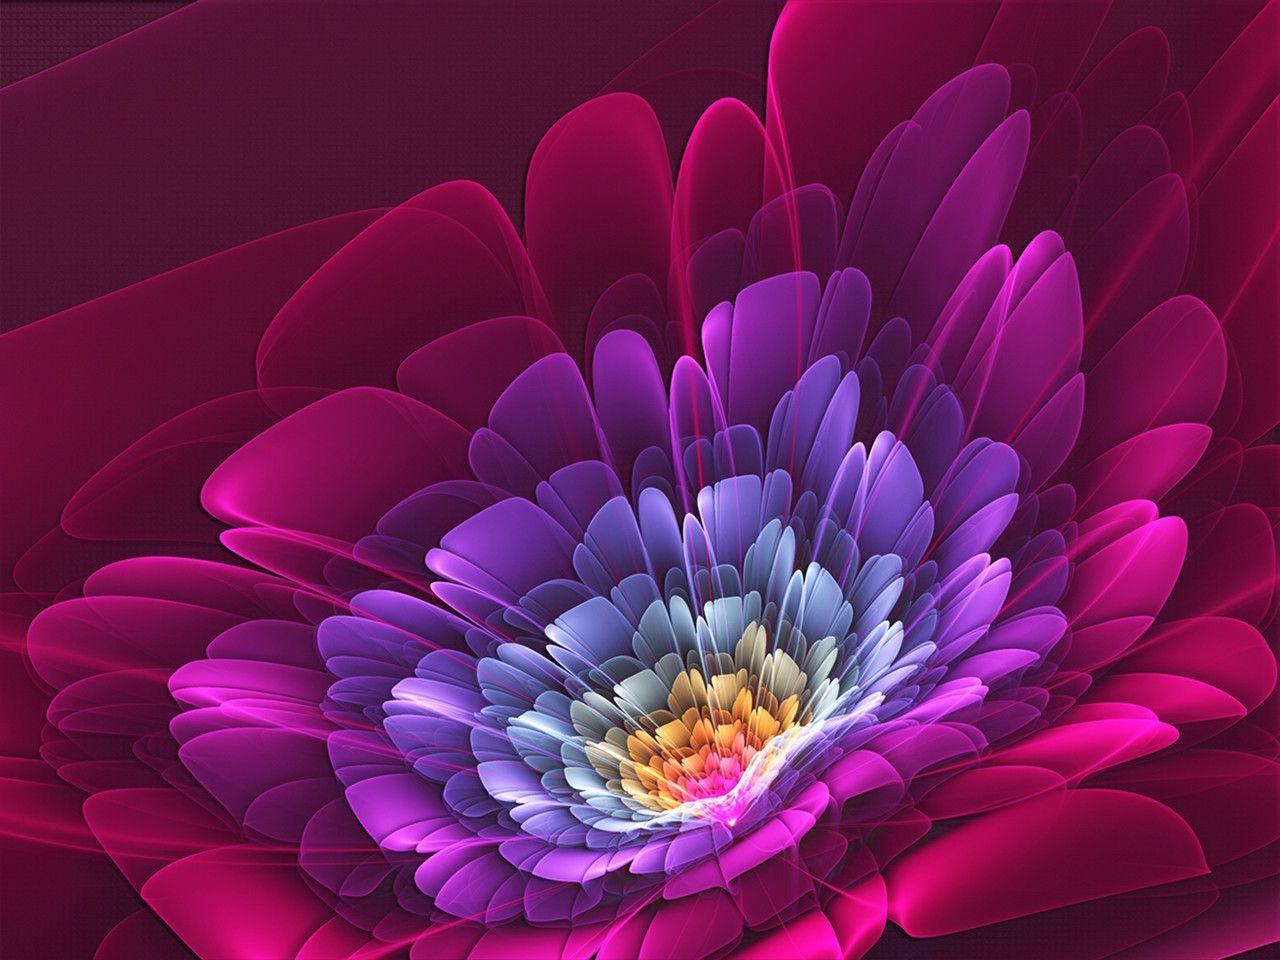 Flower Wallpaper Full Hd 1280x960